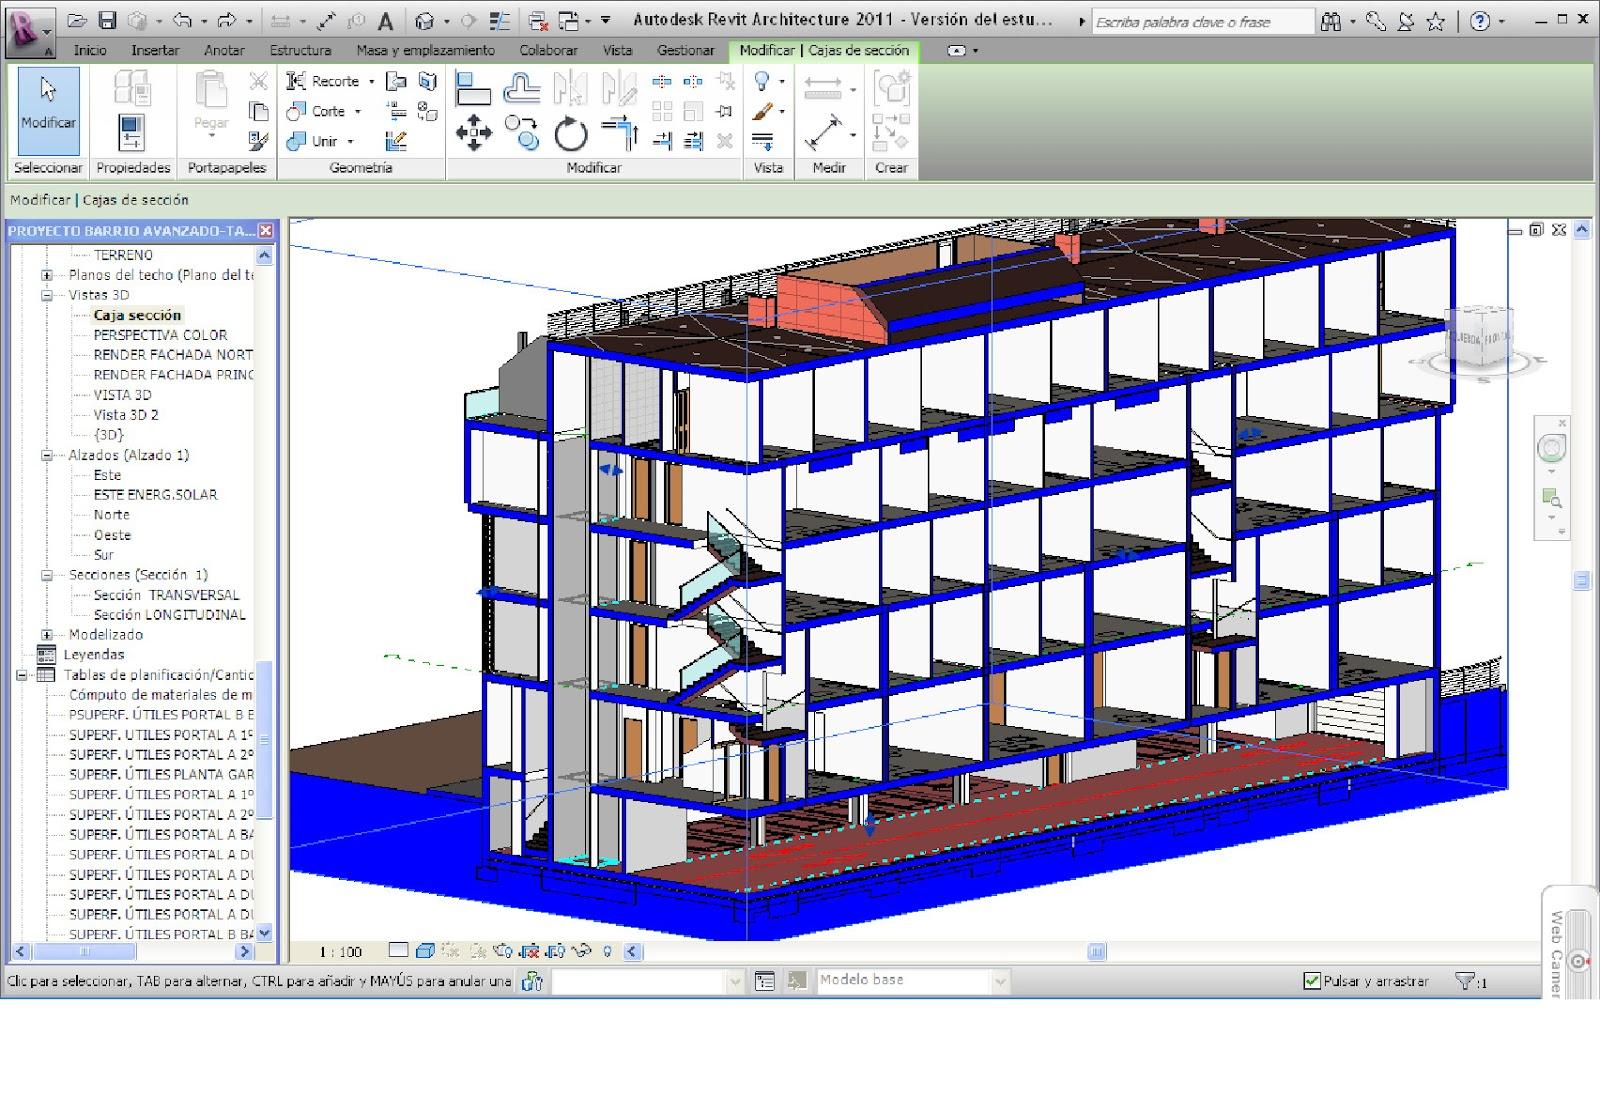 Q bim gest nuevos modelos new models revit nueva for Programas para disenar planos arquitectonicos